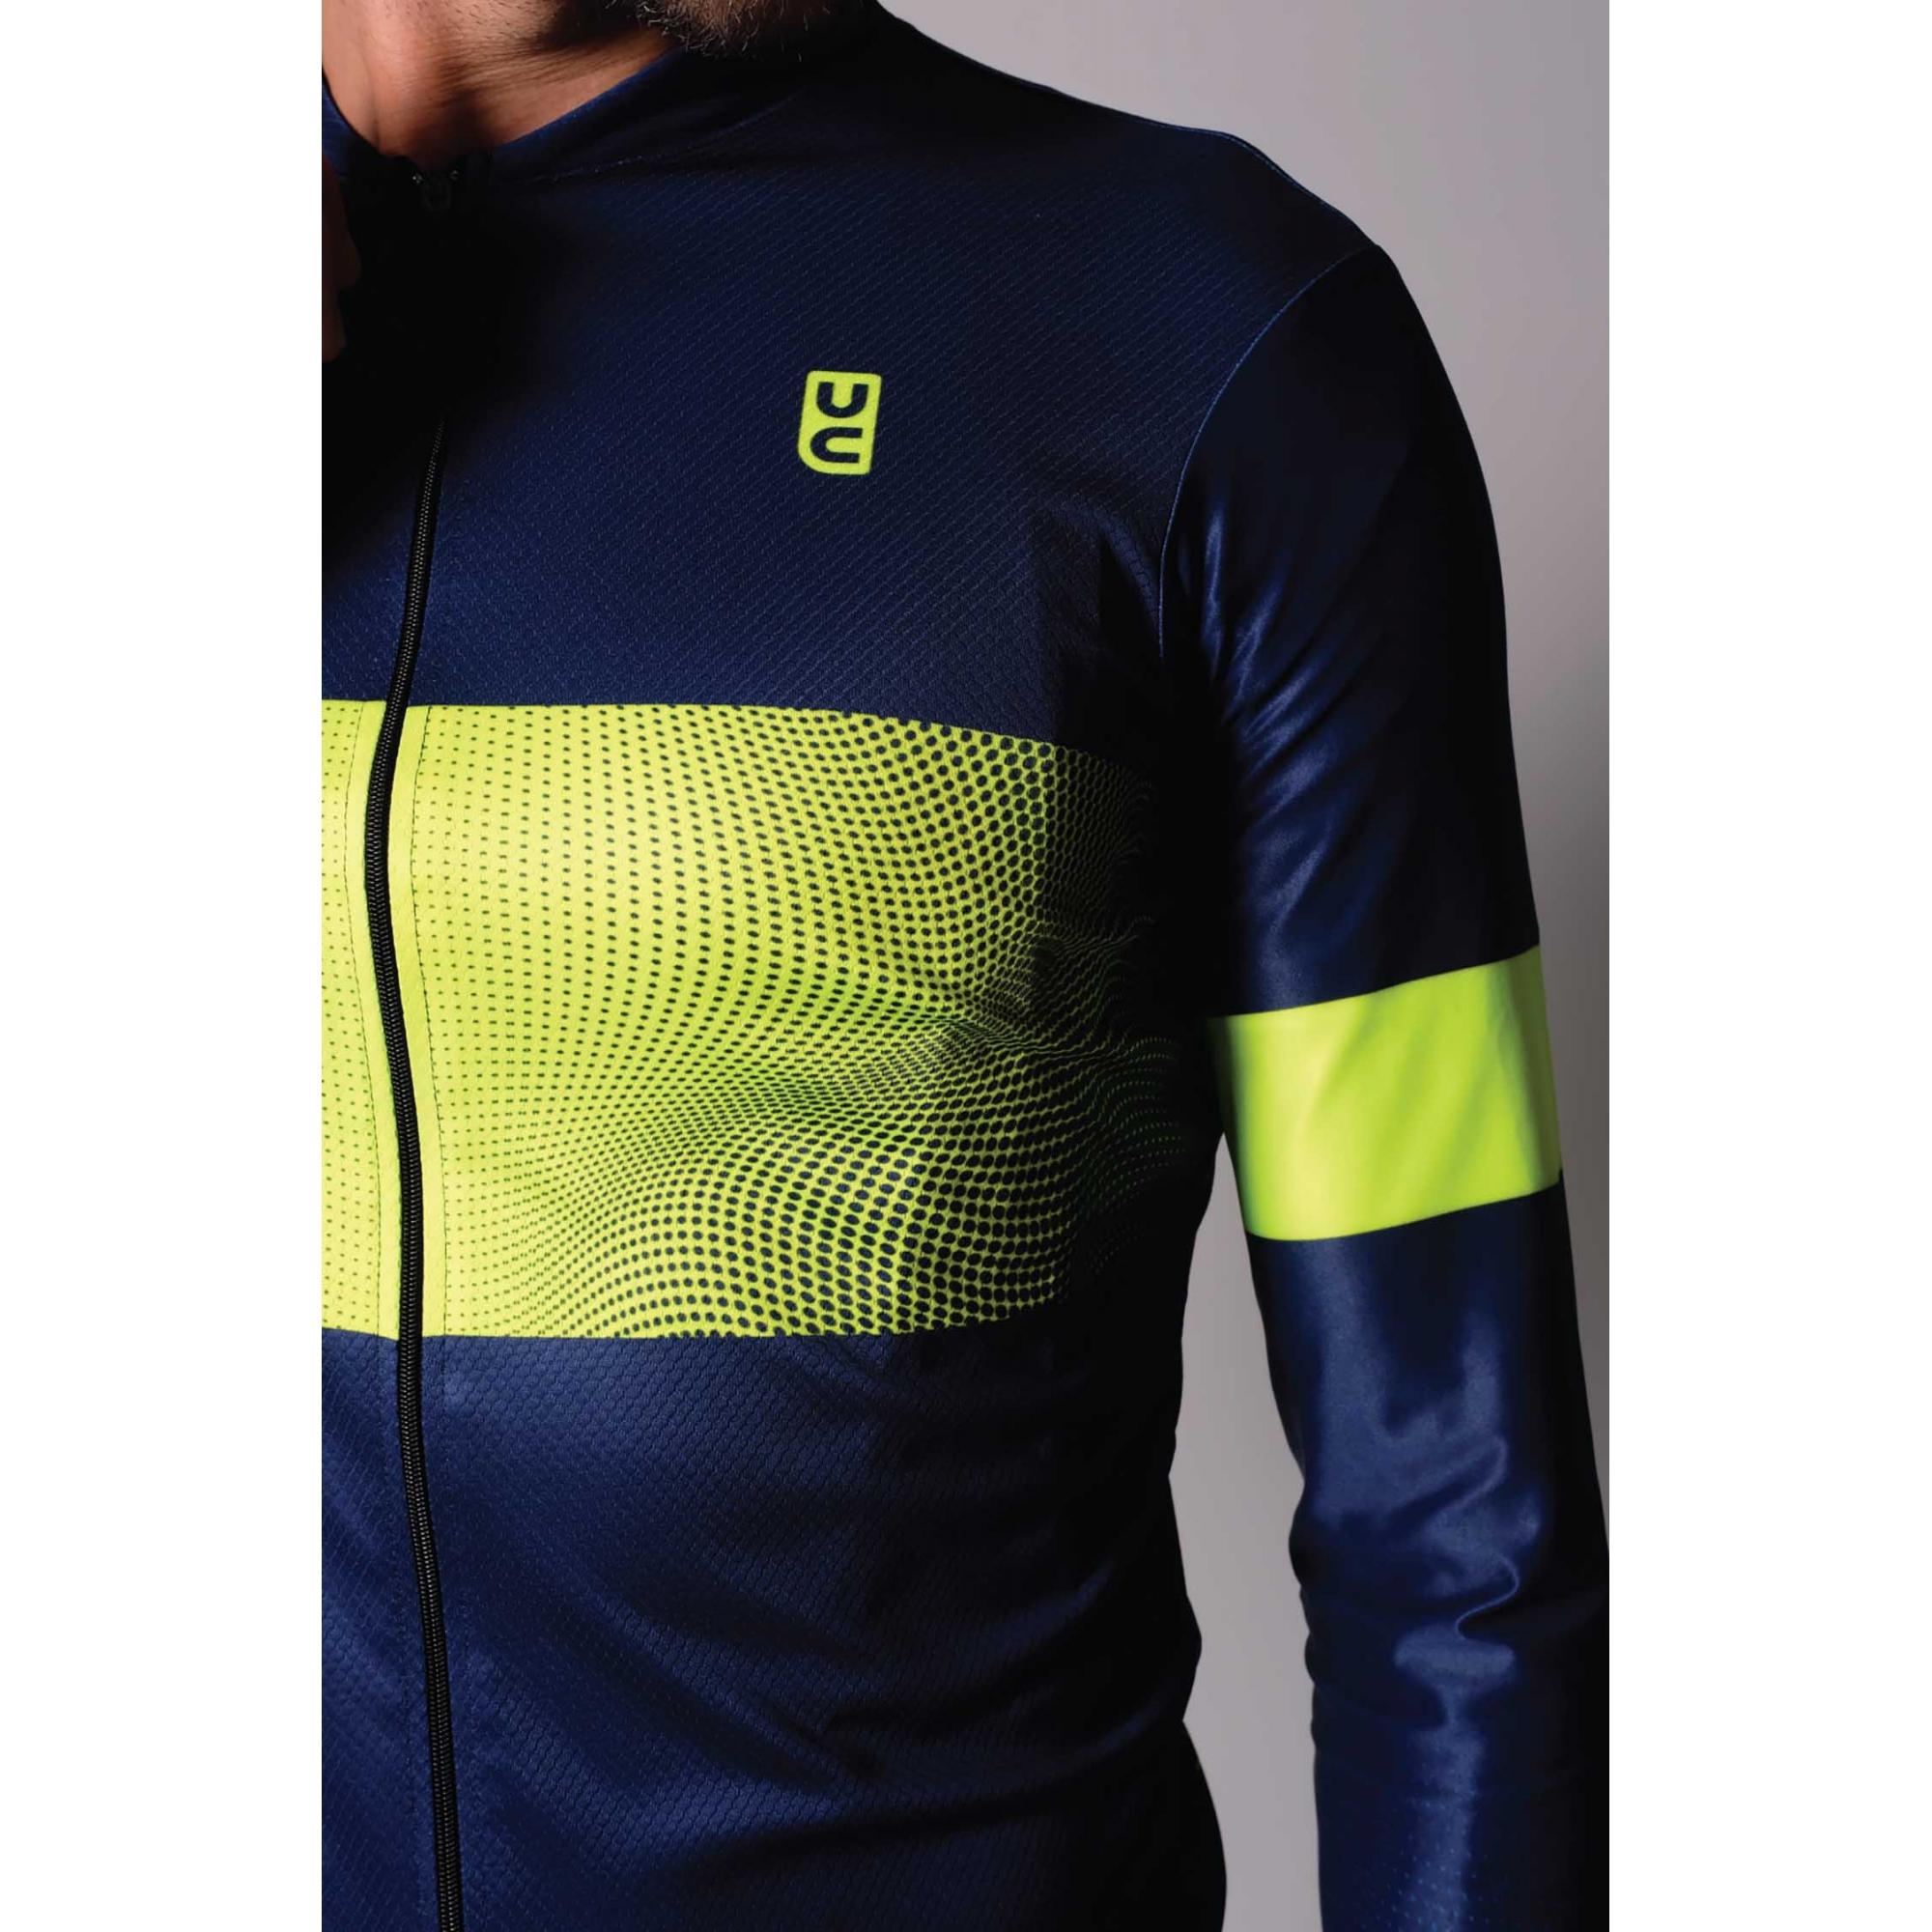 Camisa Masculina Ciclismo Manga Longa Reach - Ultracore